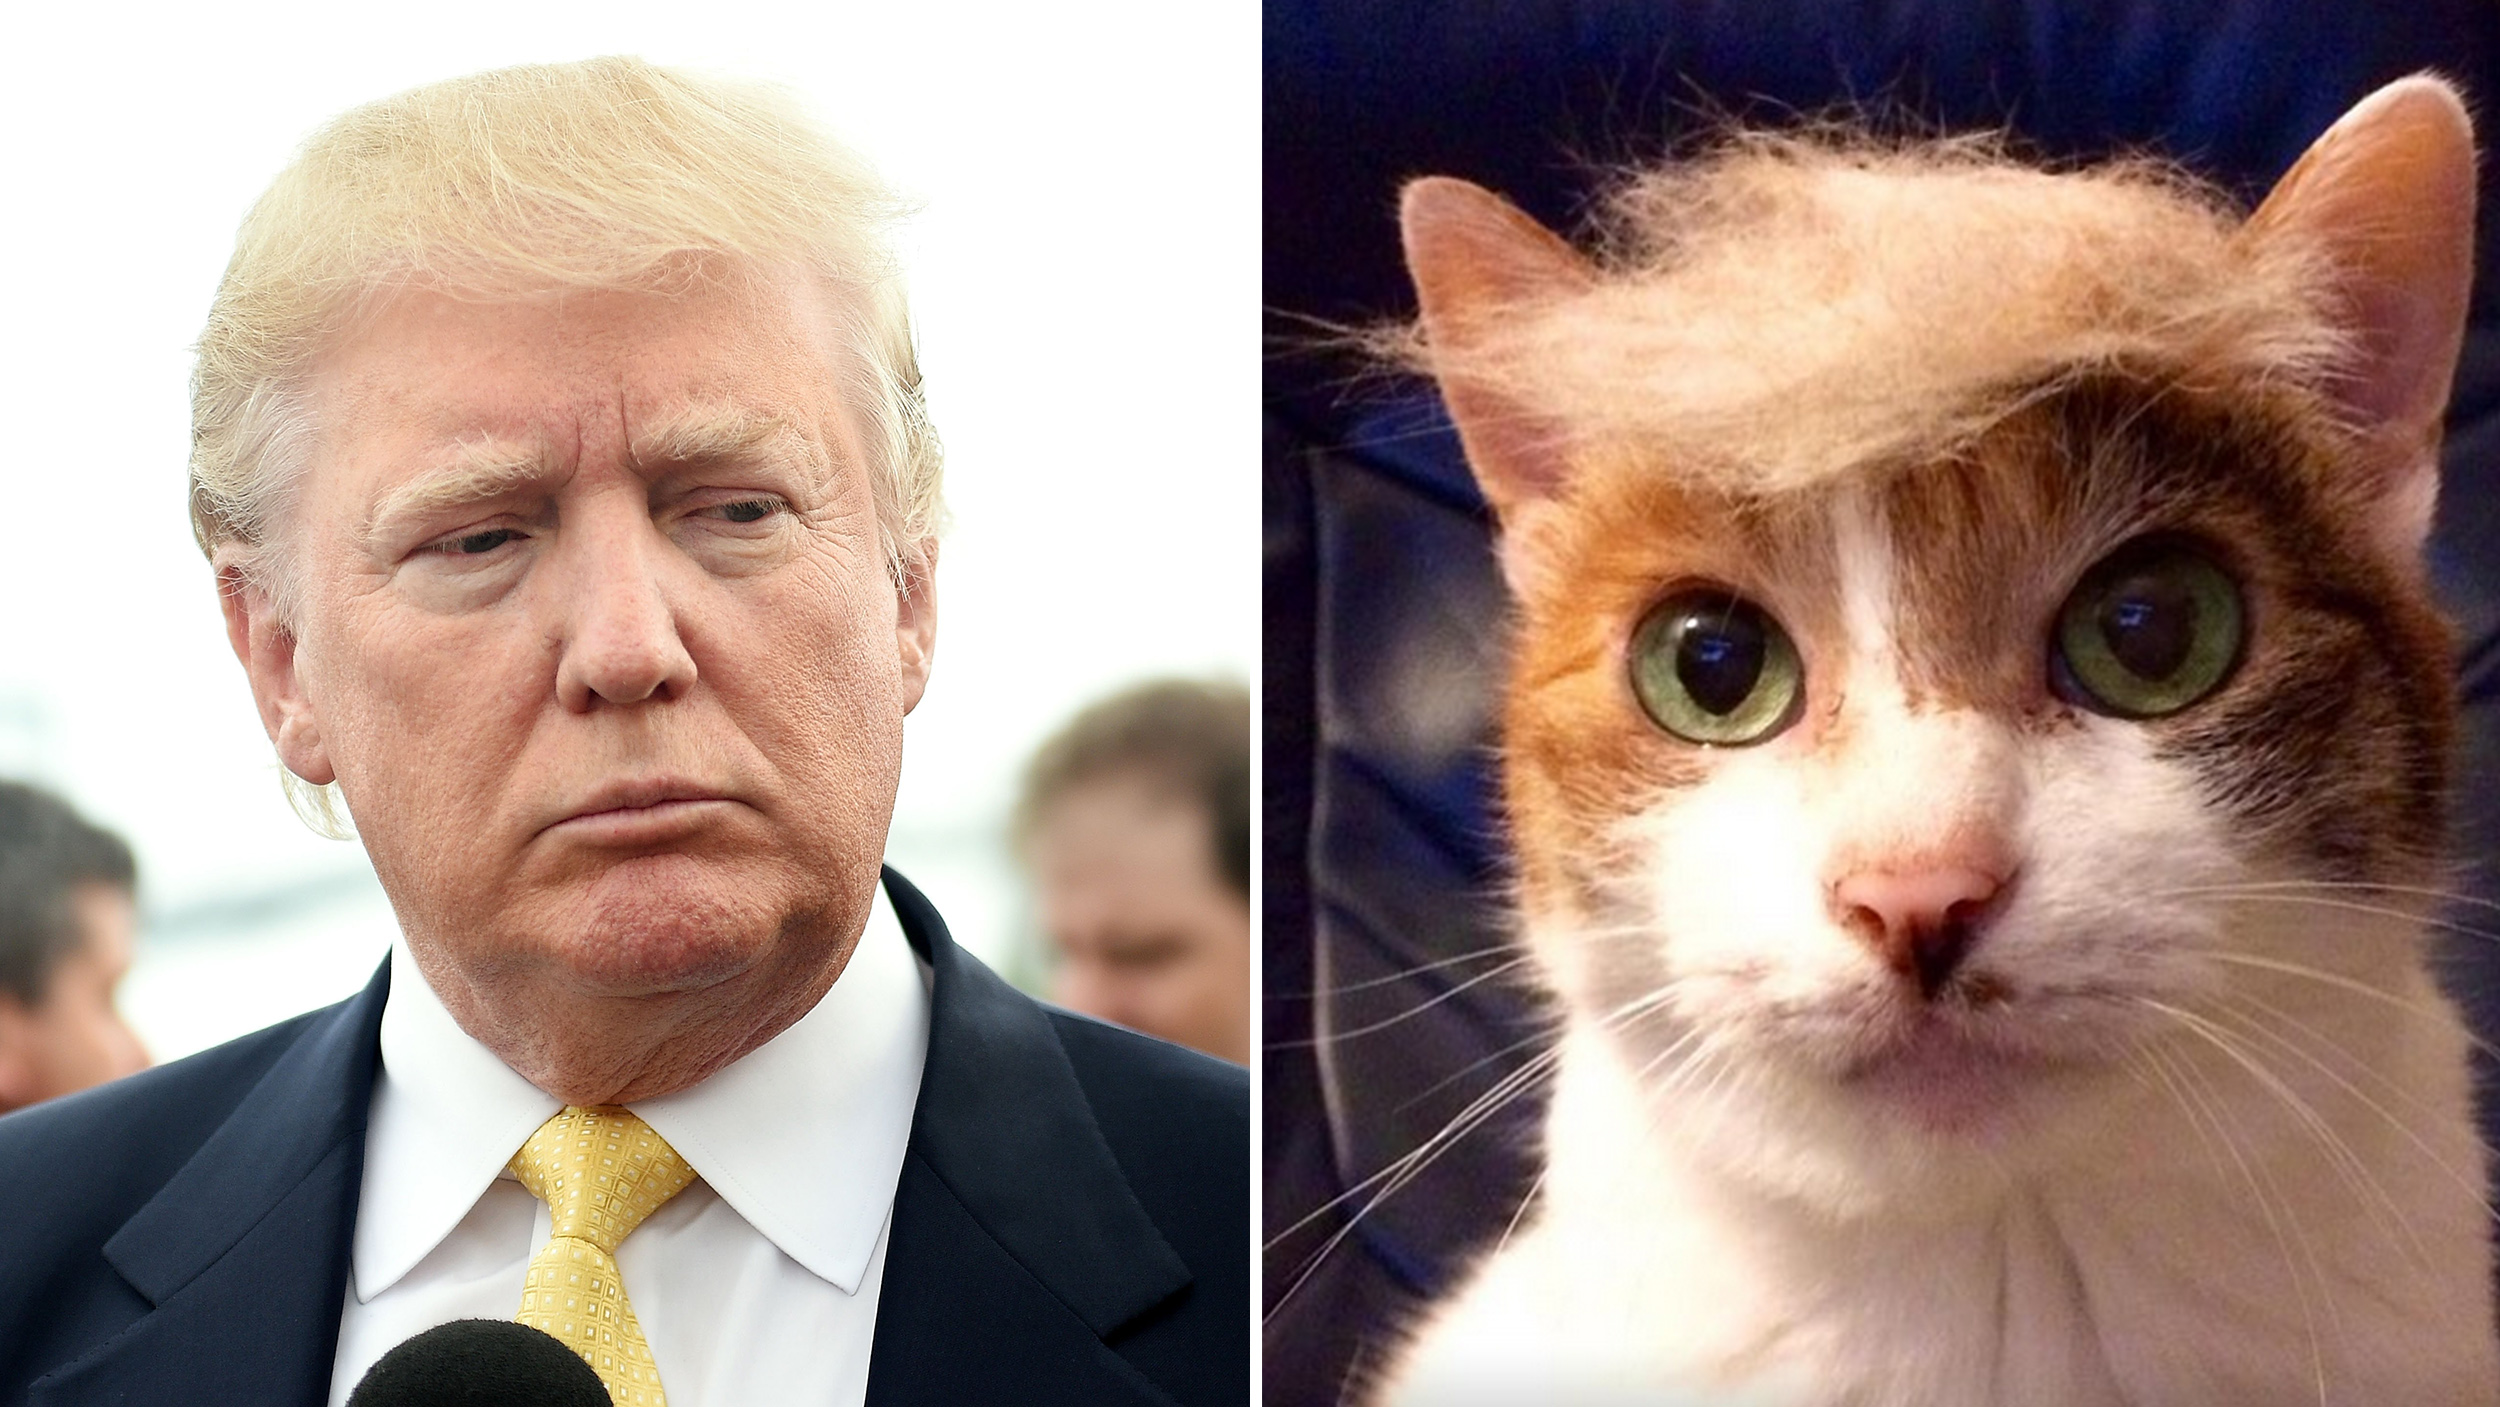 Donald Trump Funny Hair Memes : Donald trump cat hair meme whereismyvote